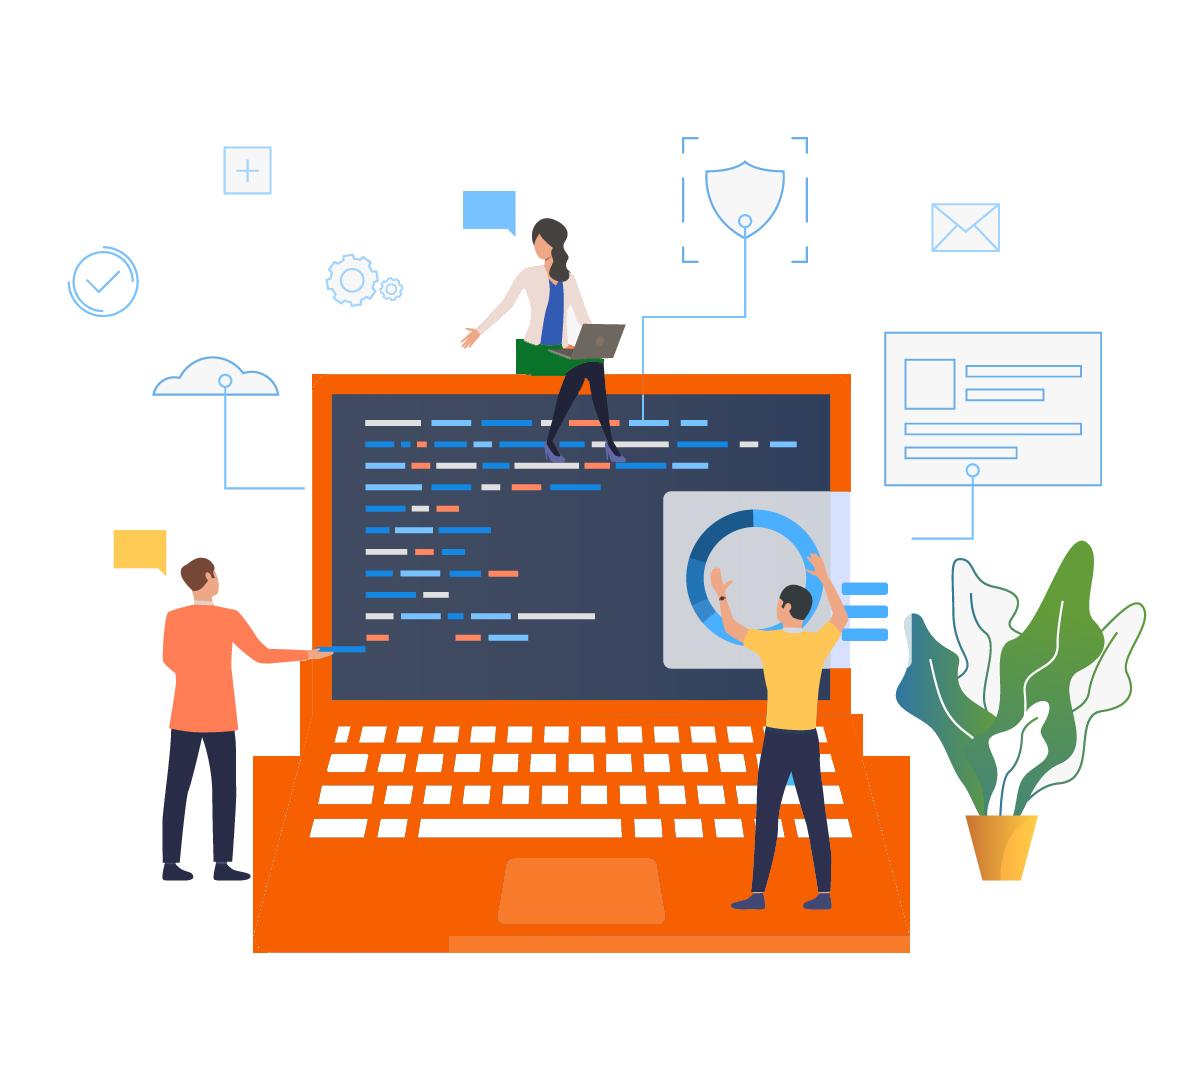 web development surrey - Website Development